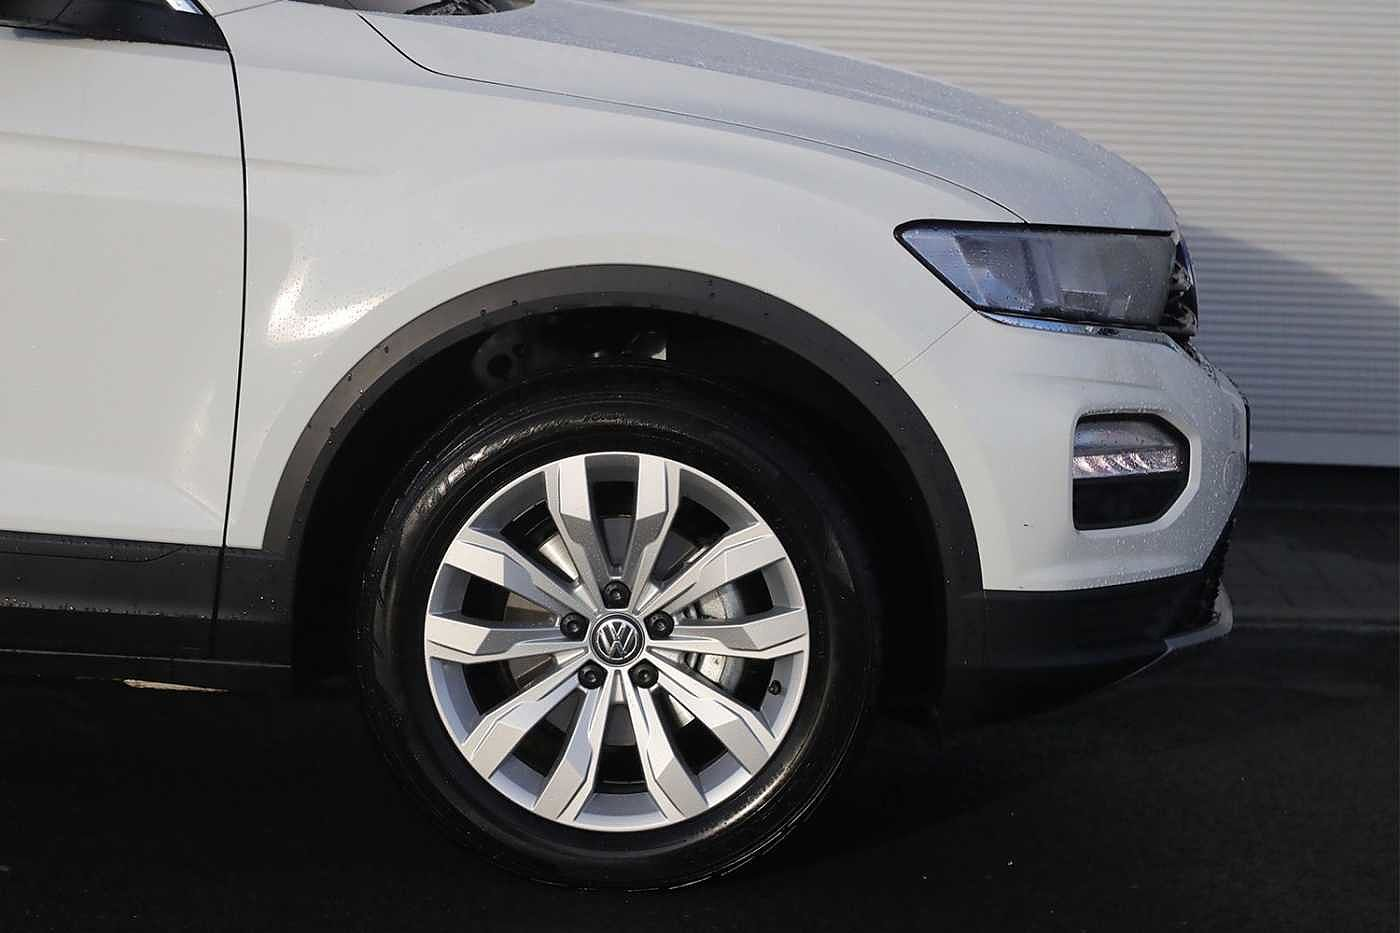 69 Reg 2019 Volkswagen T-ROC 1.0 TSI